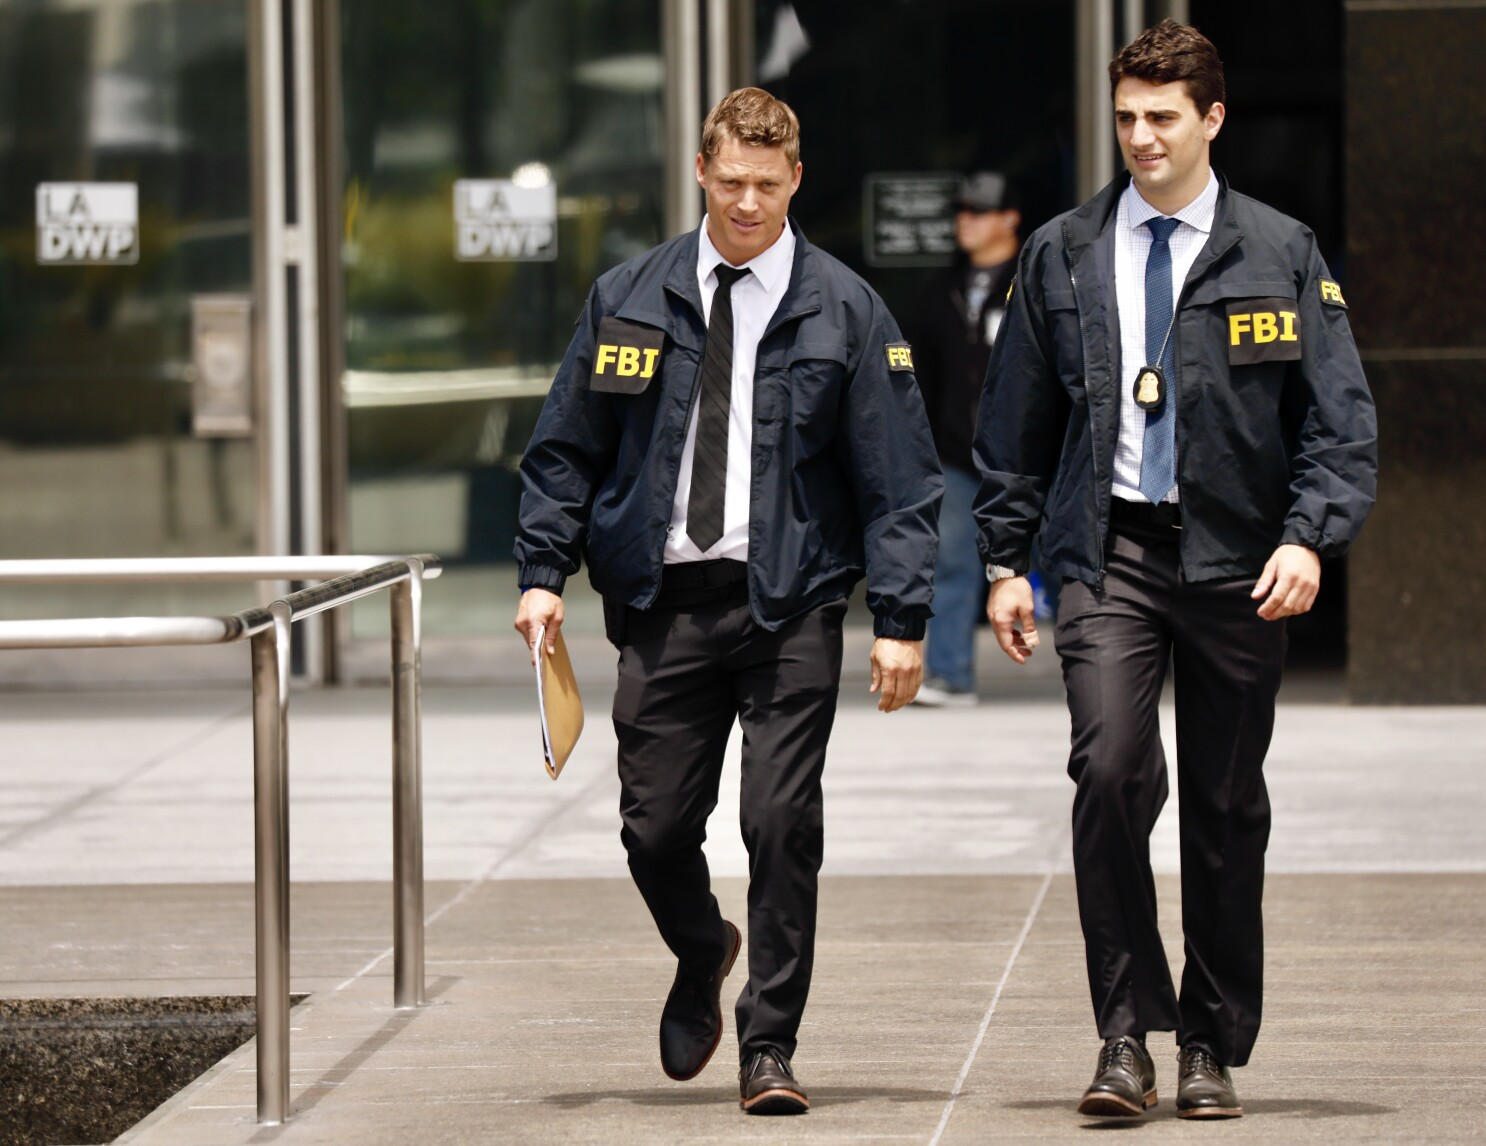 Dramatic FBI raids at L.A. City Hall and the DWP scandal that won ...